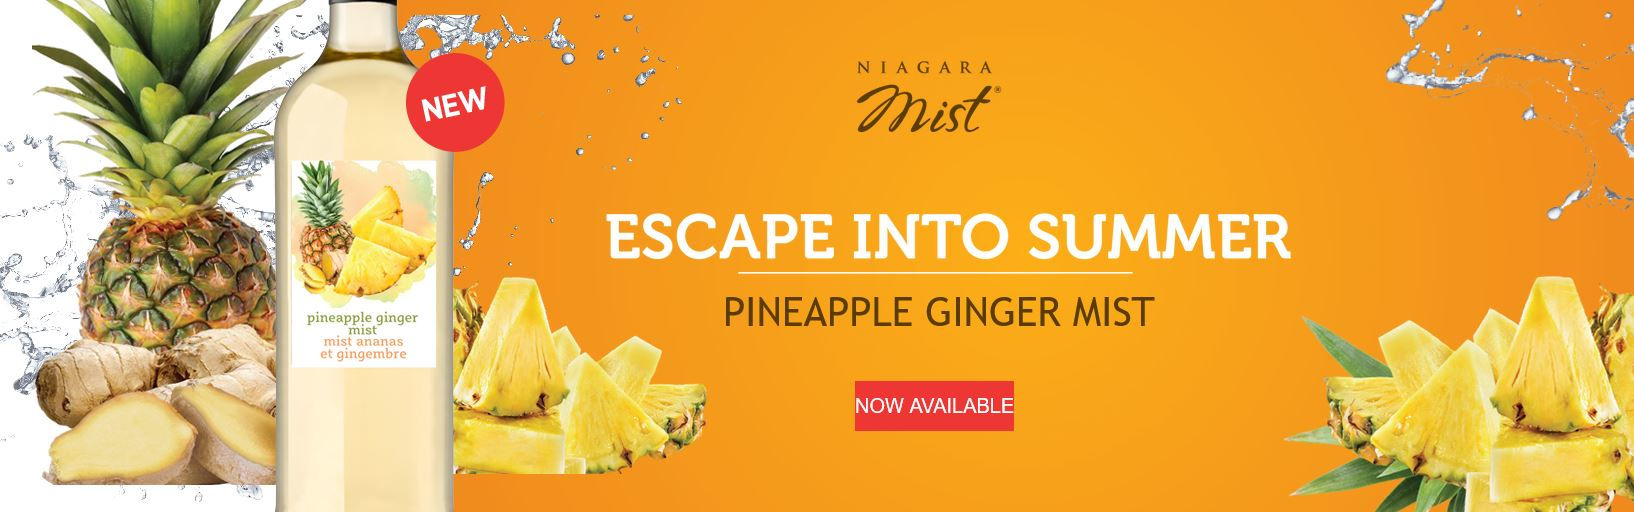 Pinapple Giner Mist